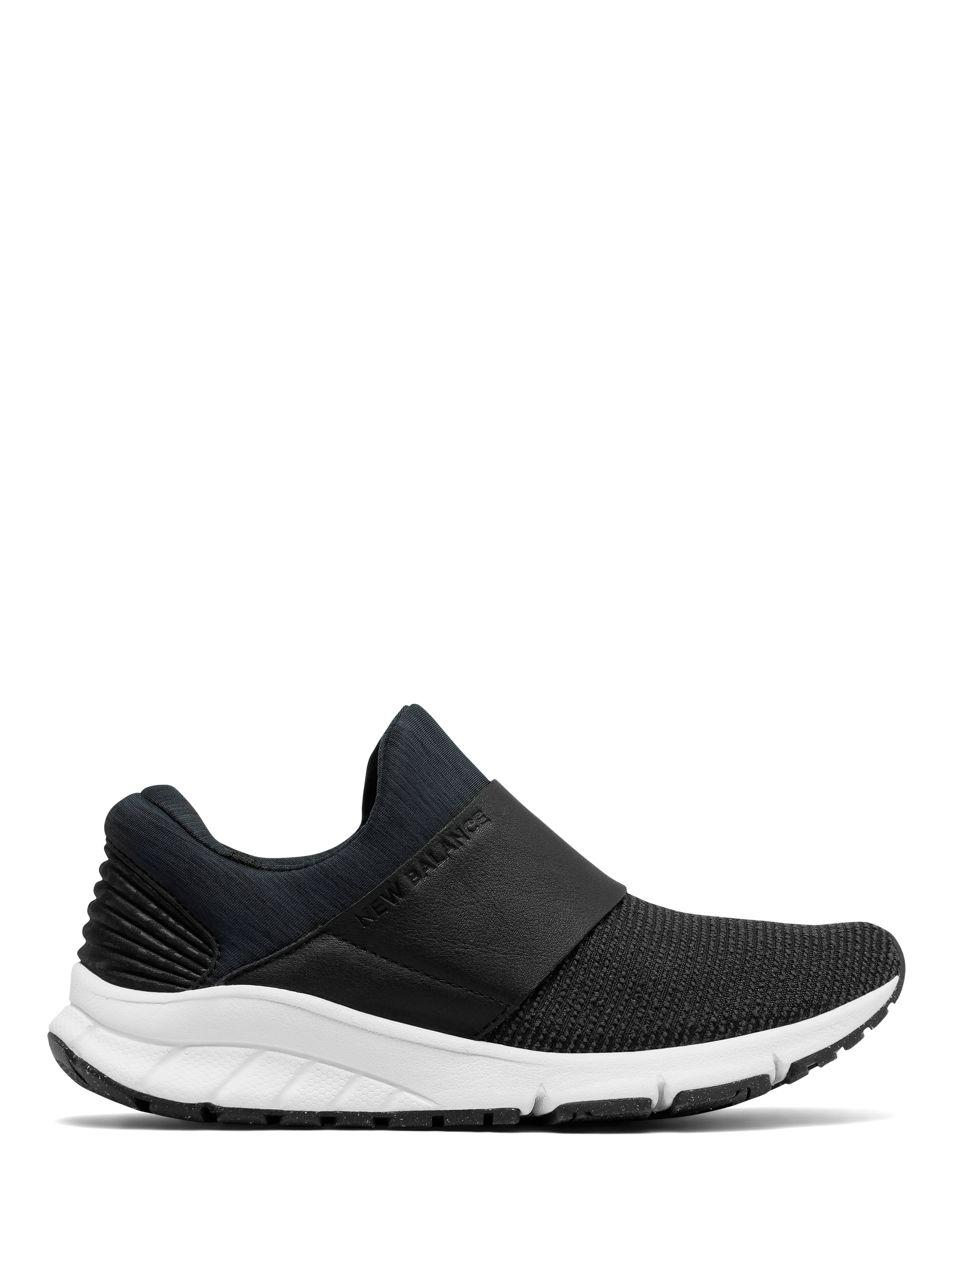 New Balance FuelCore Rush Slip-On Sneaker 2BrQcwmH